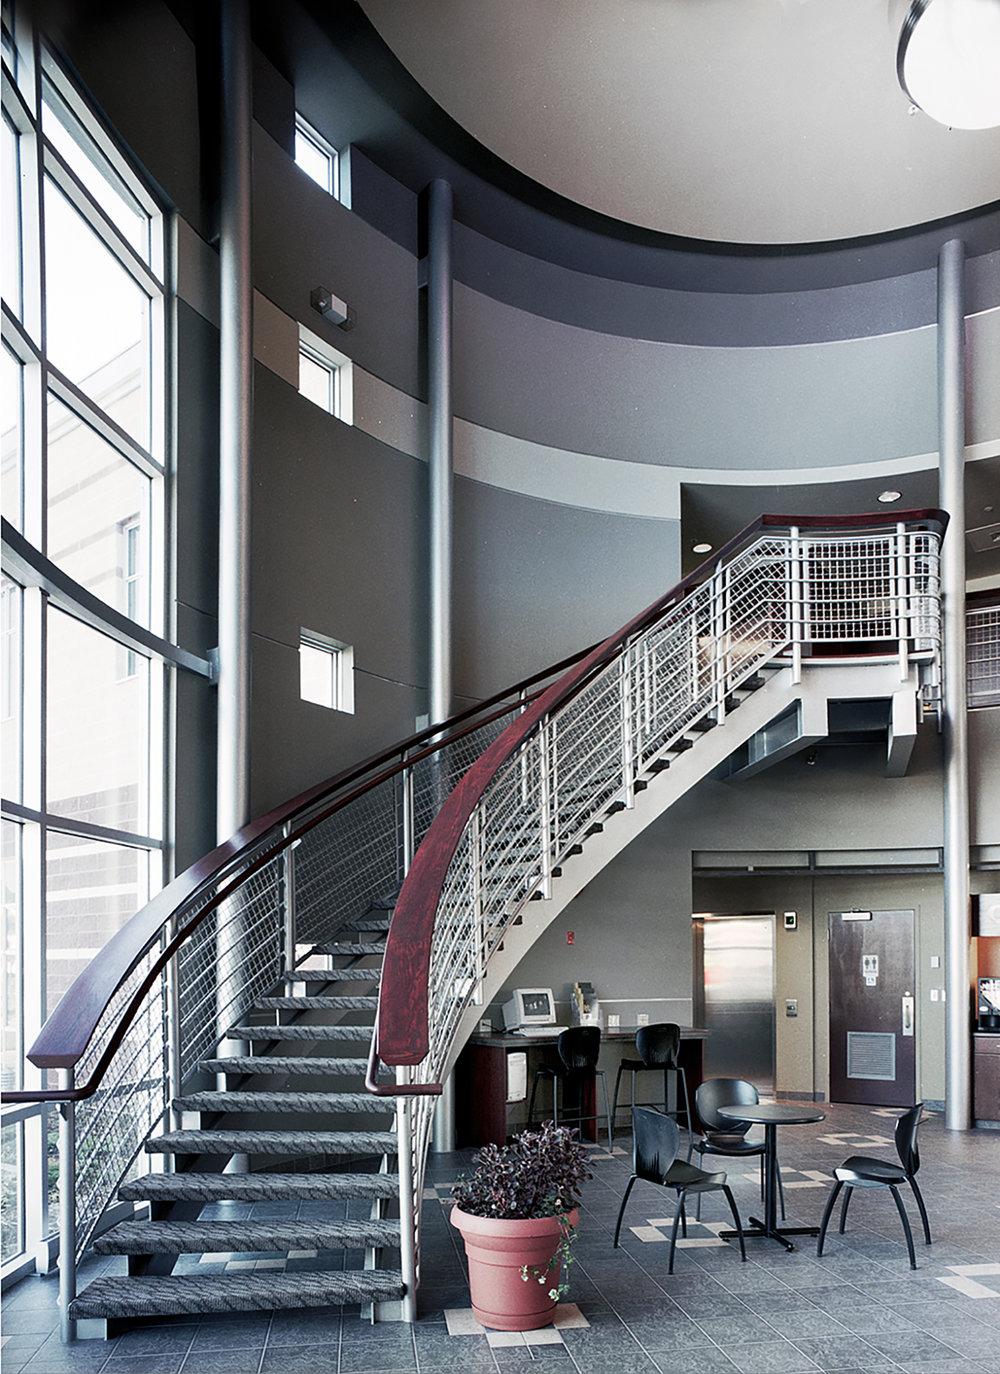 Holy Spirit (Entegra) Credit Union, interior photo of stairway